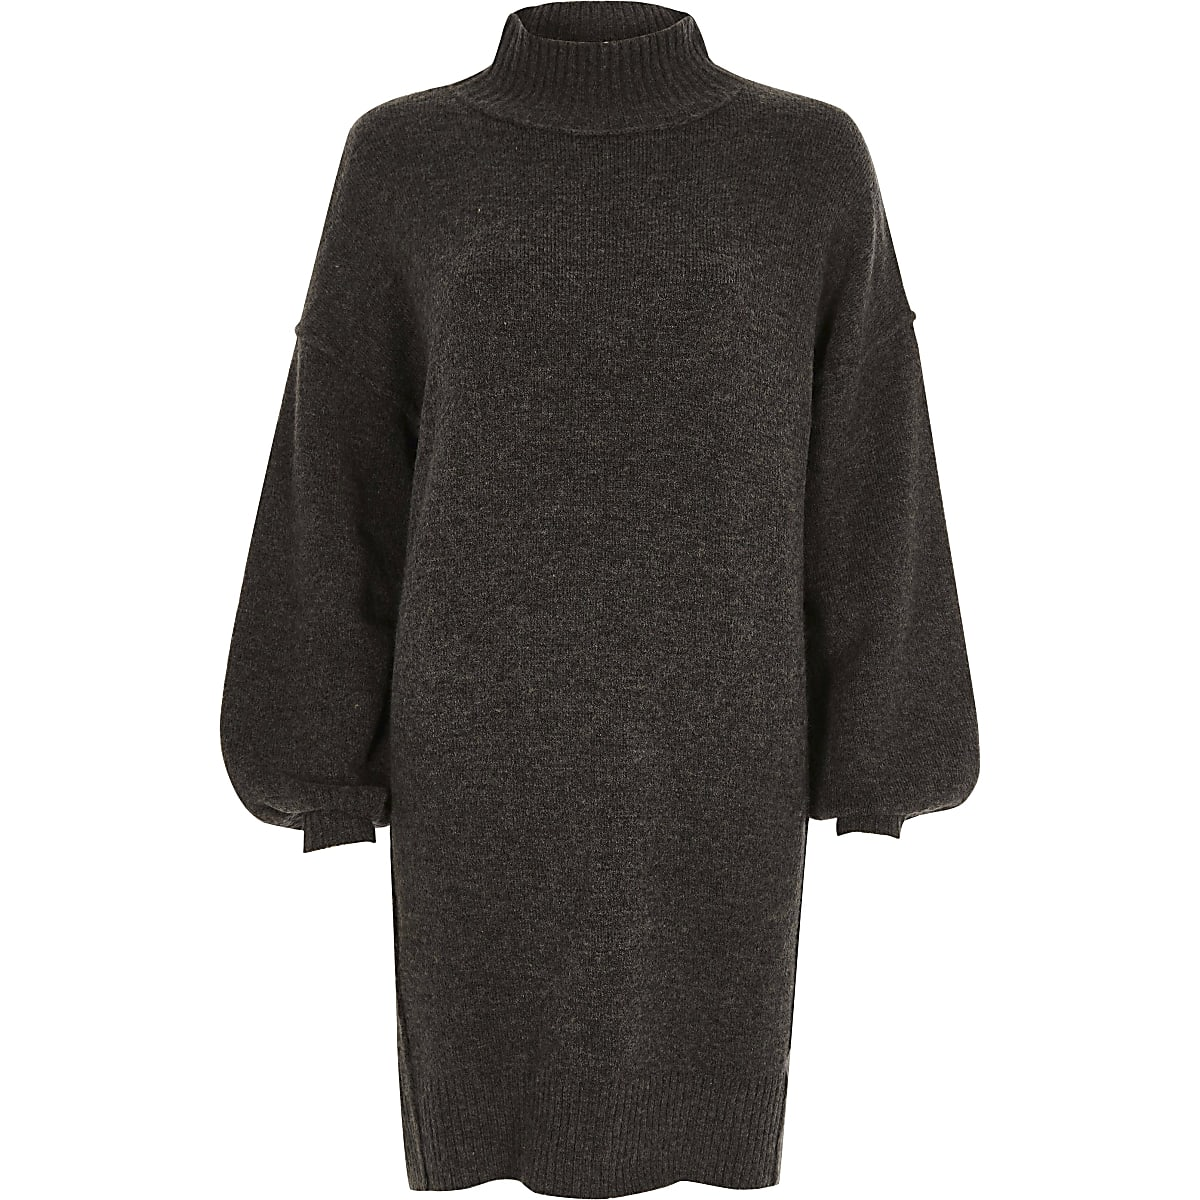 b0b03b0ecd7 Robe pull en maille gris foncé à manches bouffantes - Robes trapèze ...